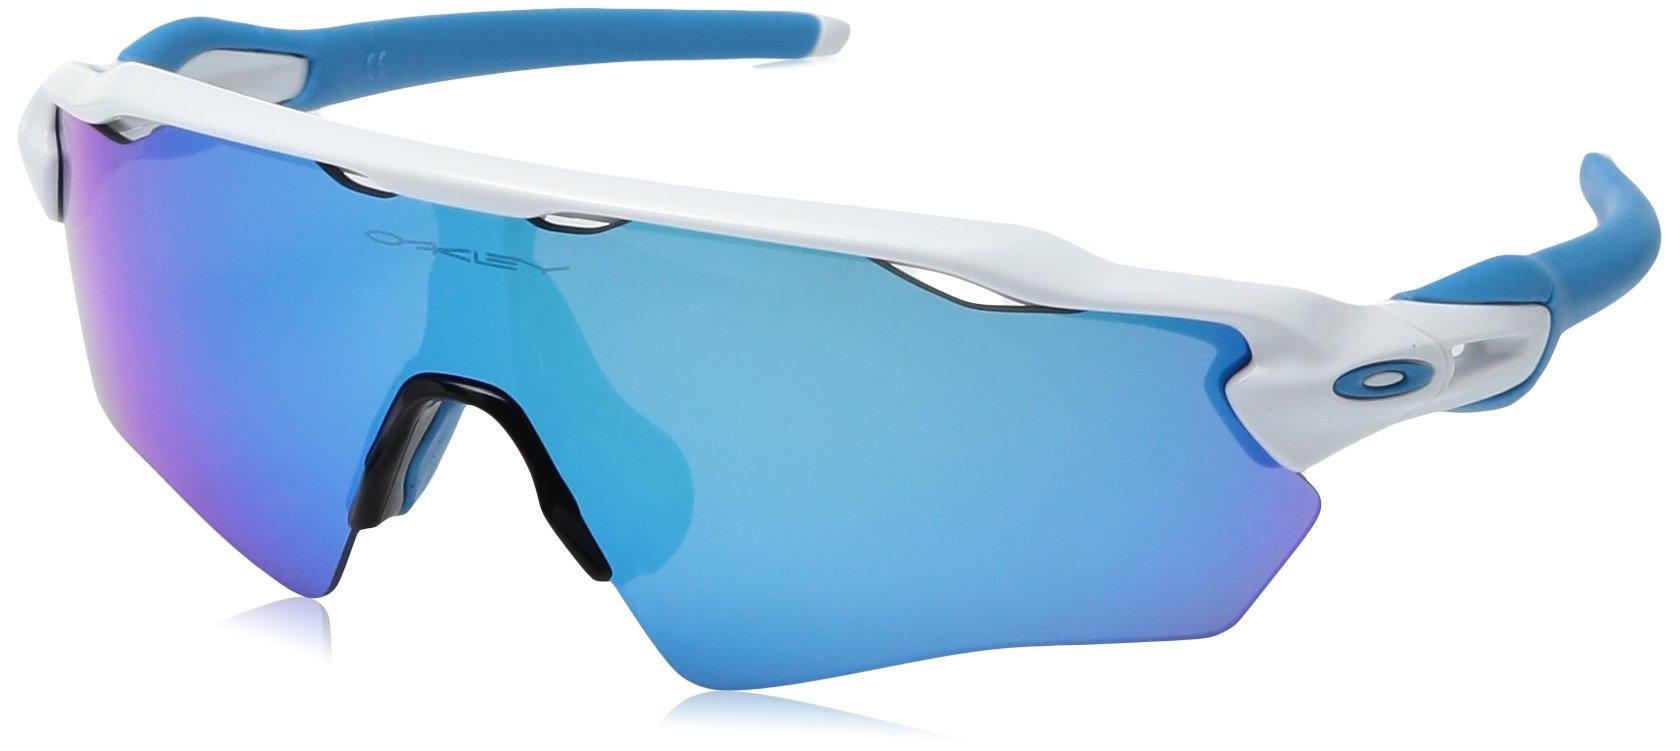 oakley sport sunglasses amazon com rh amazon com